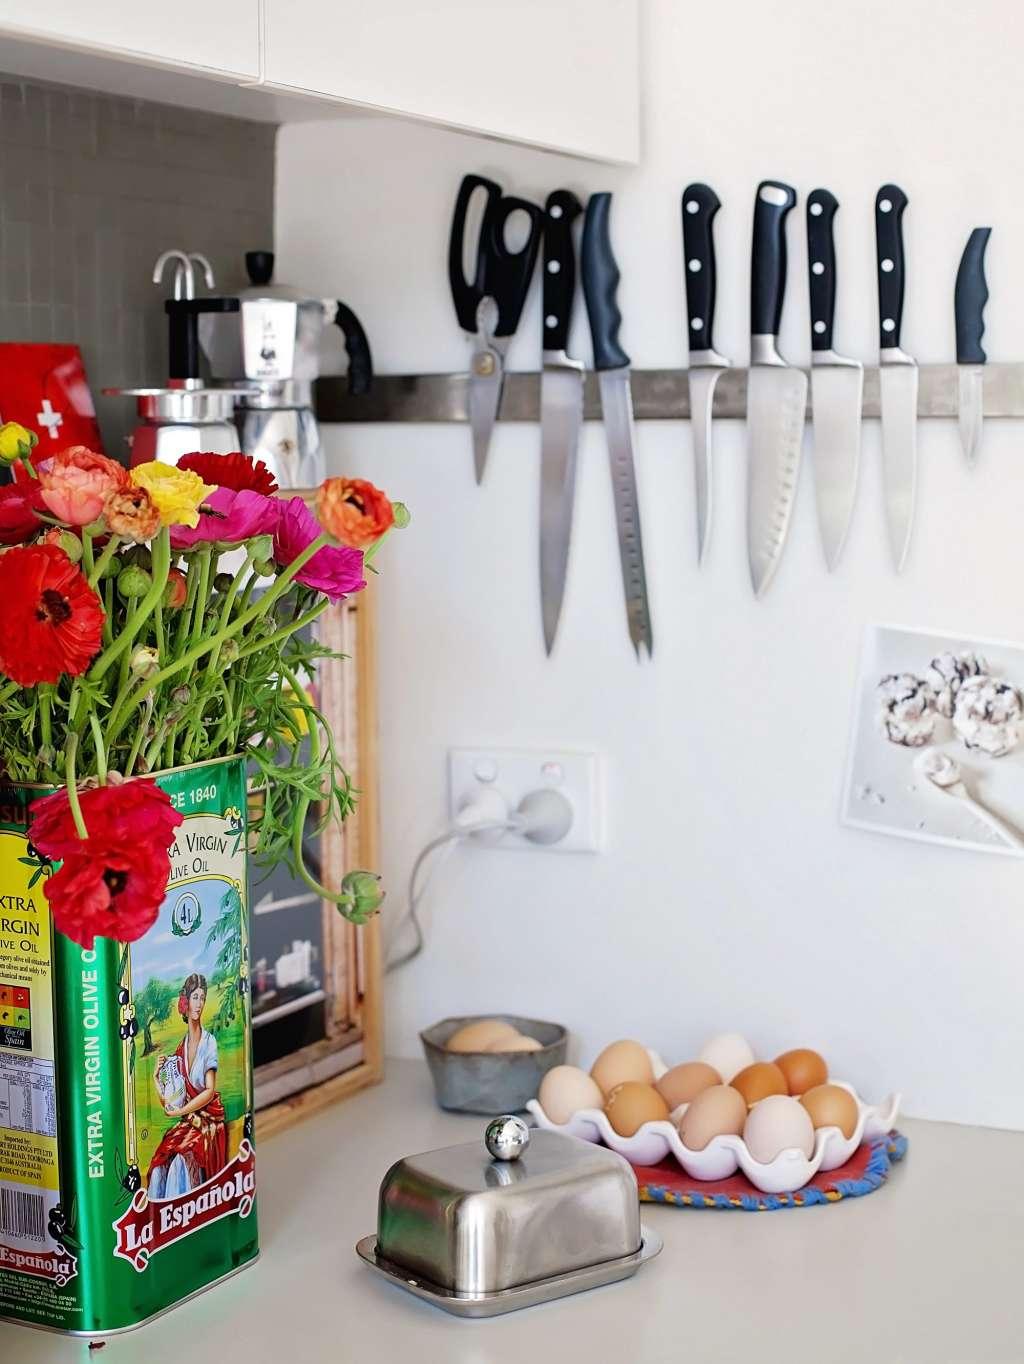 Ideas to Add Storage to a Small Kitchen